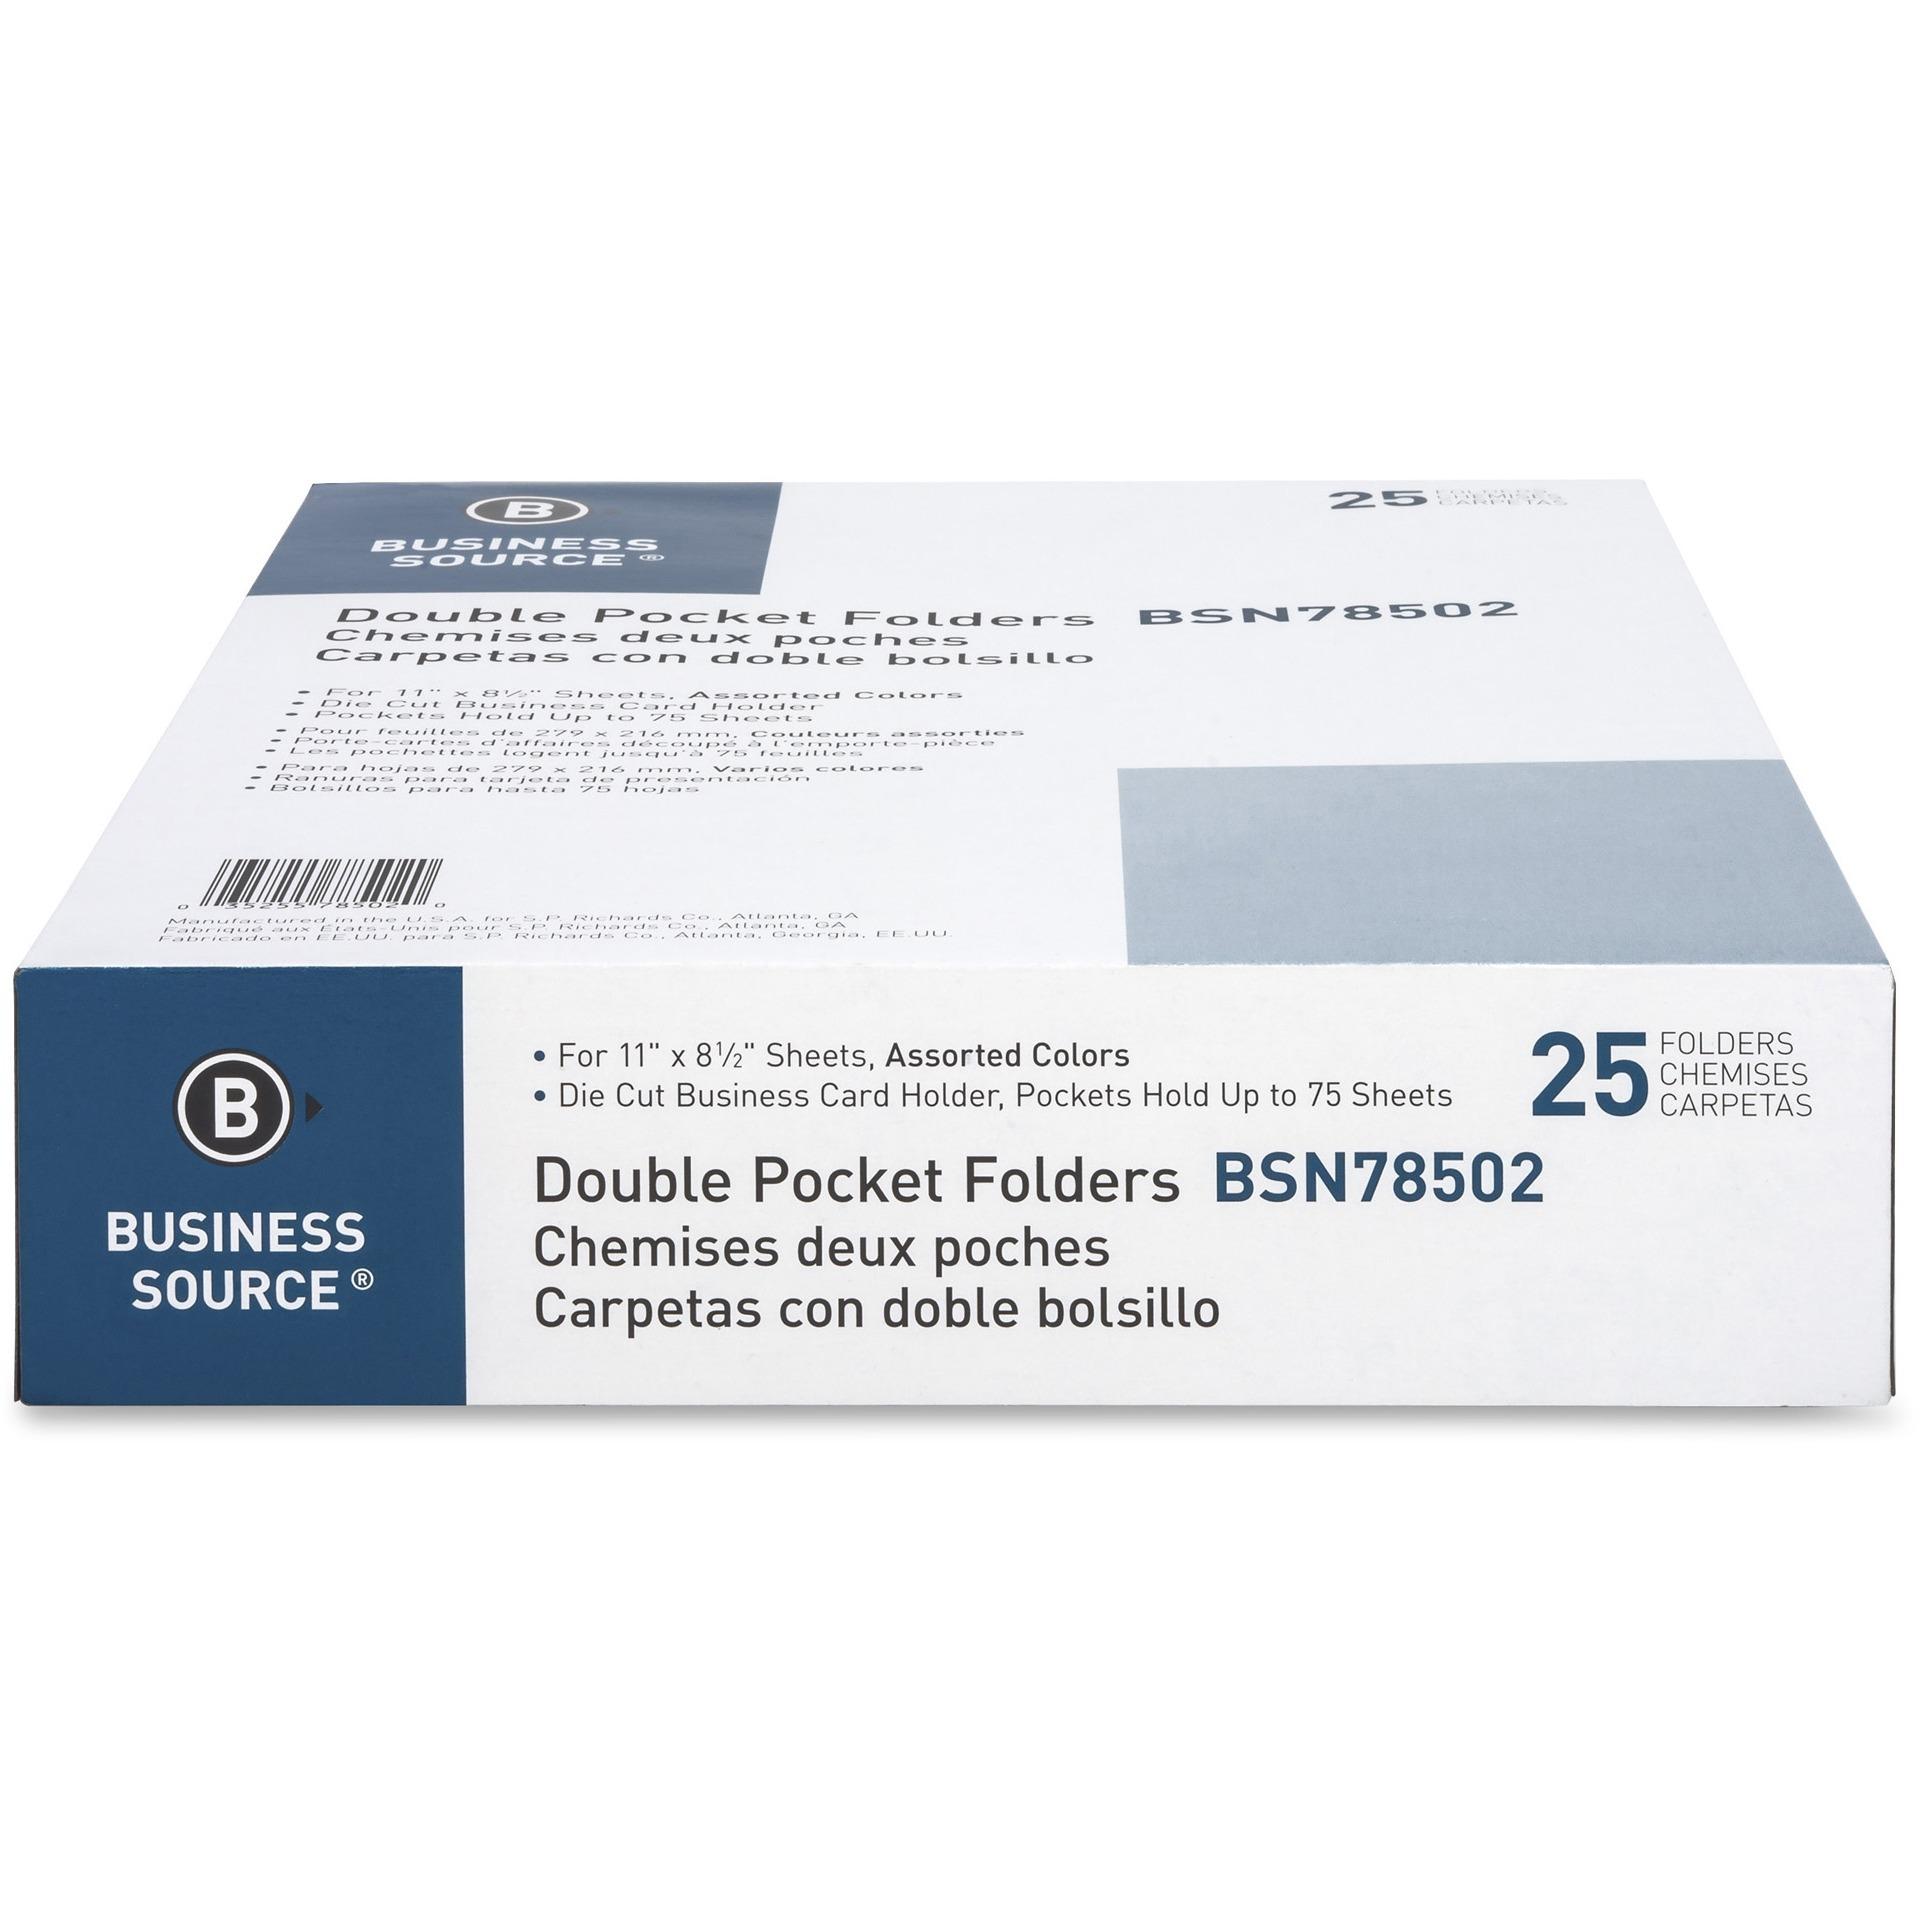 BSN78502 Business Source Two-Pocket Folders | Office Advantage